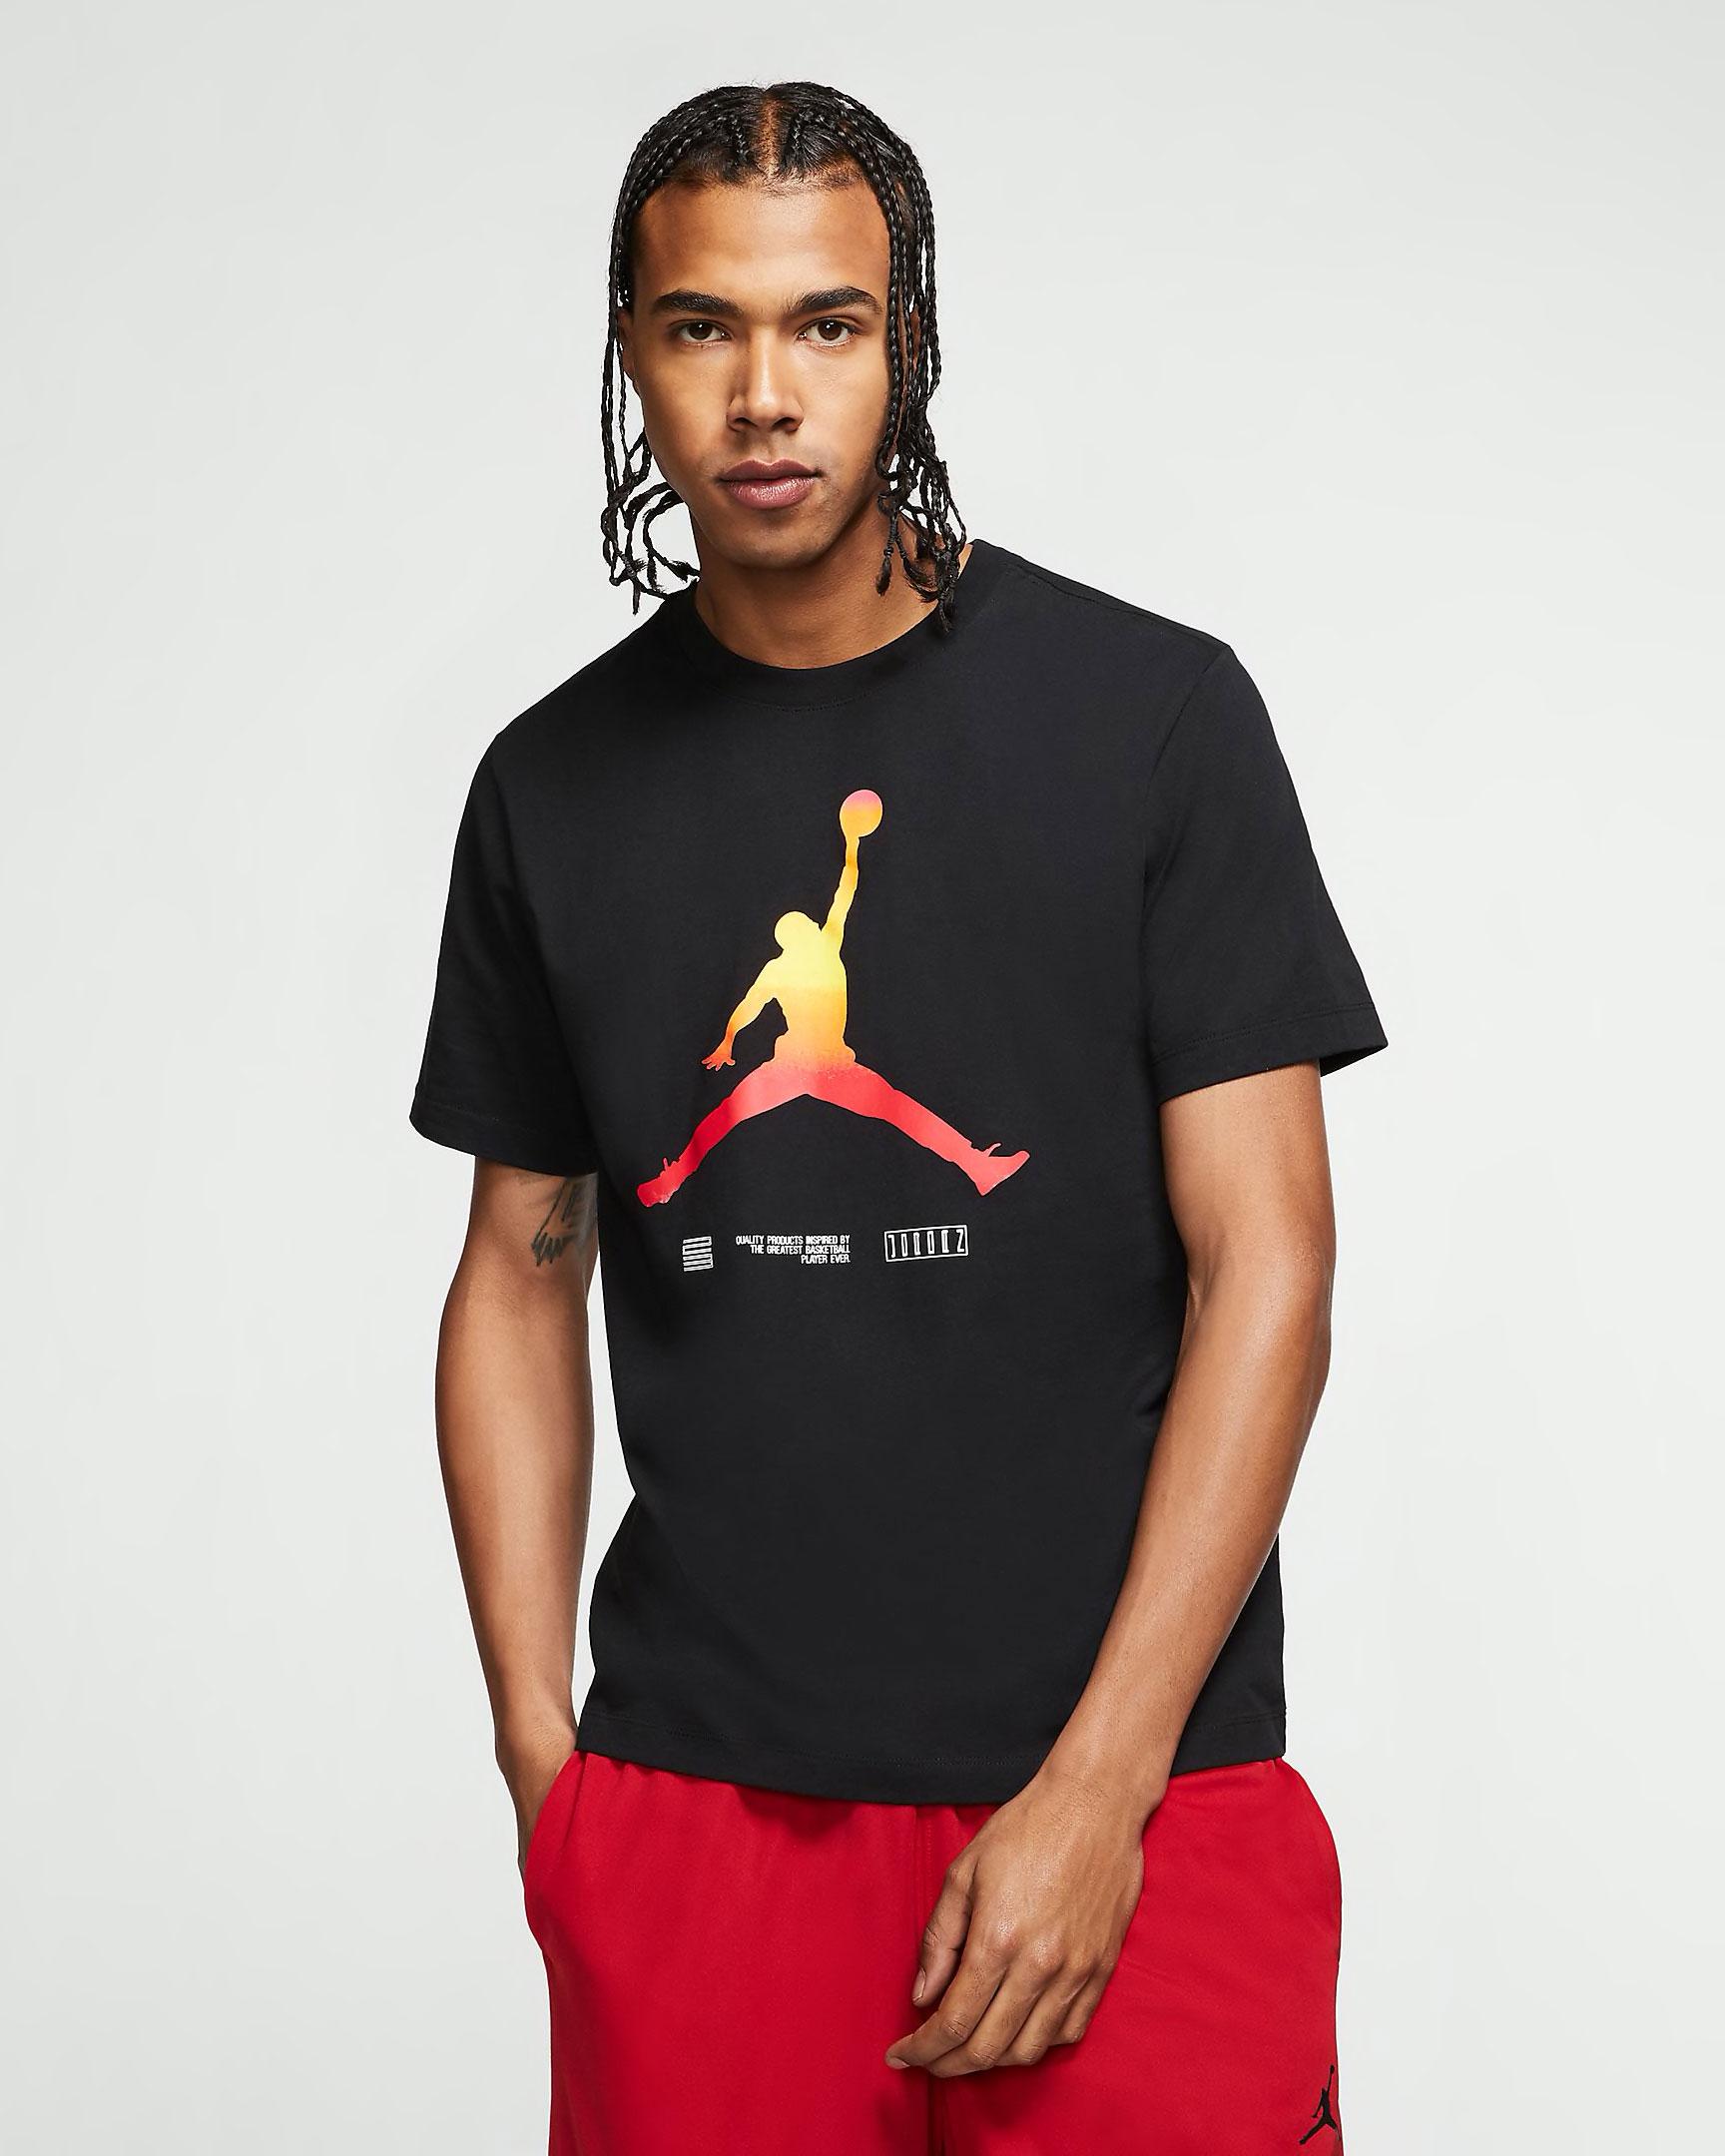 jordan-11-low-concord-bred-jumpman-shirt-black